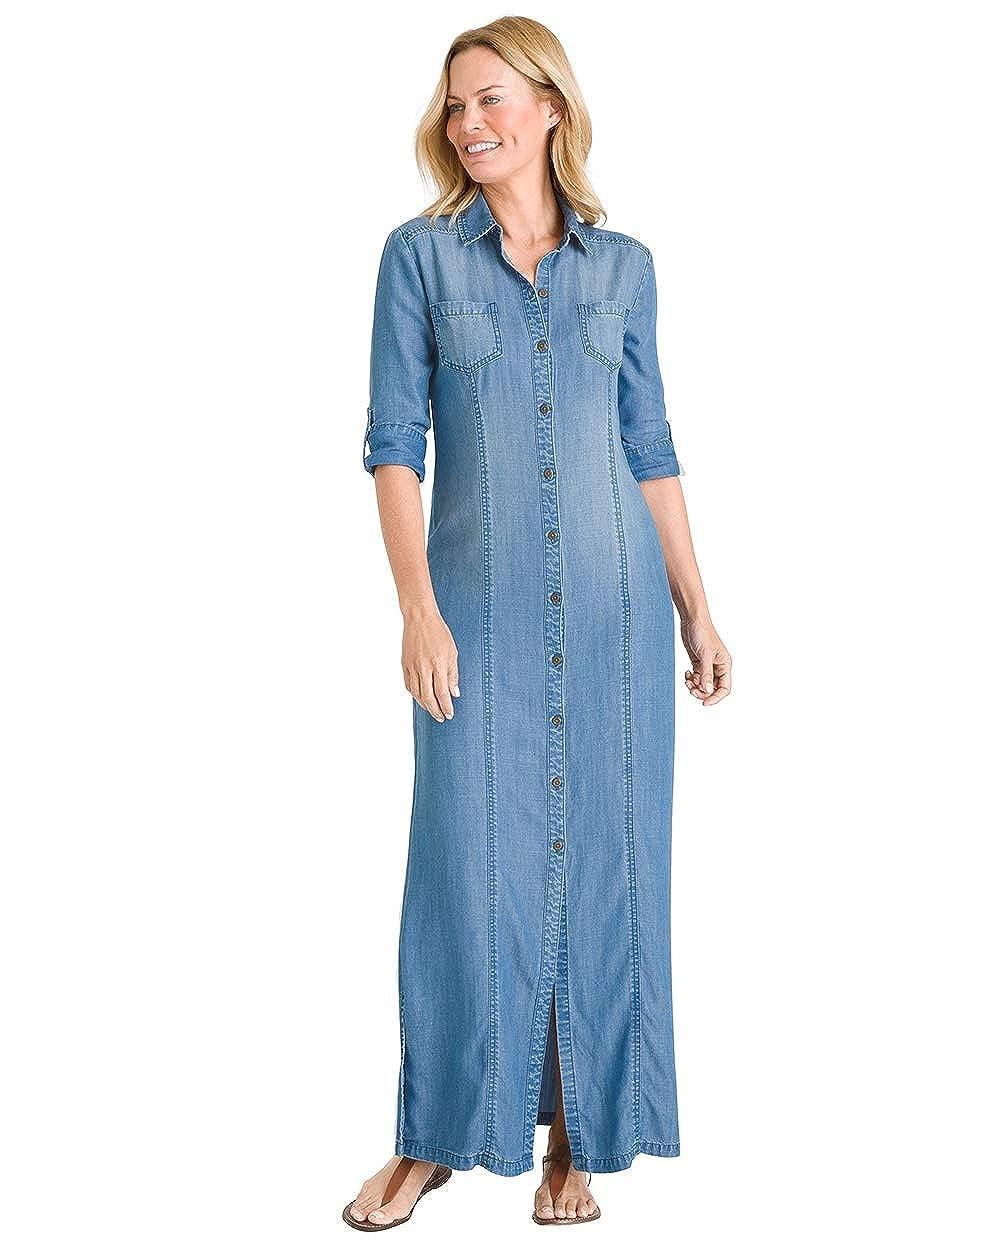 a87fbc3060 Chico s Women s Washed Denim Maxi Dress at Amazon Women s Clothing ...